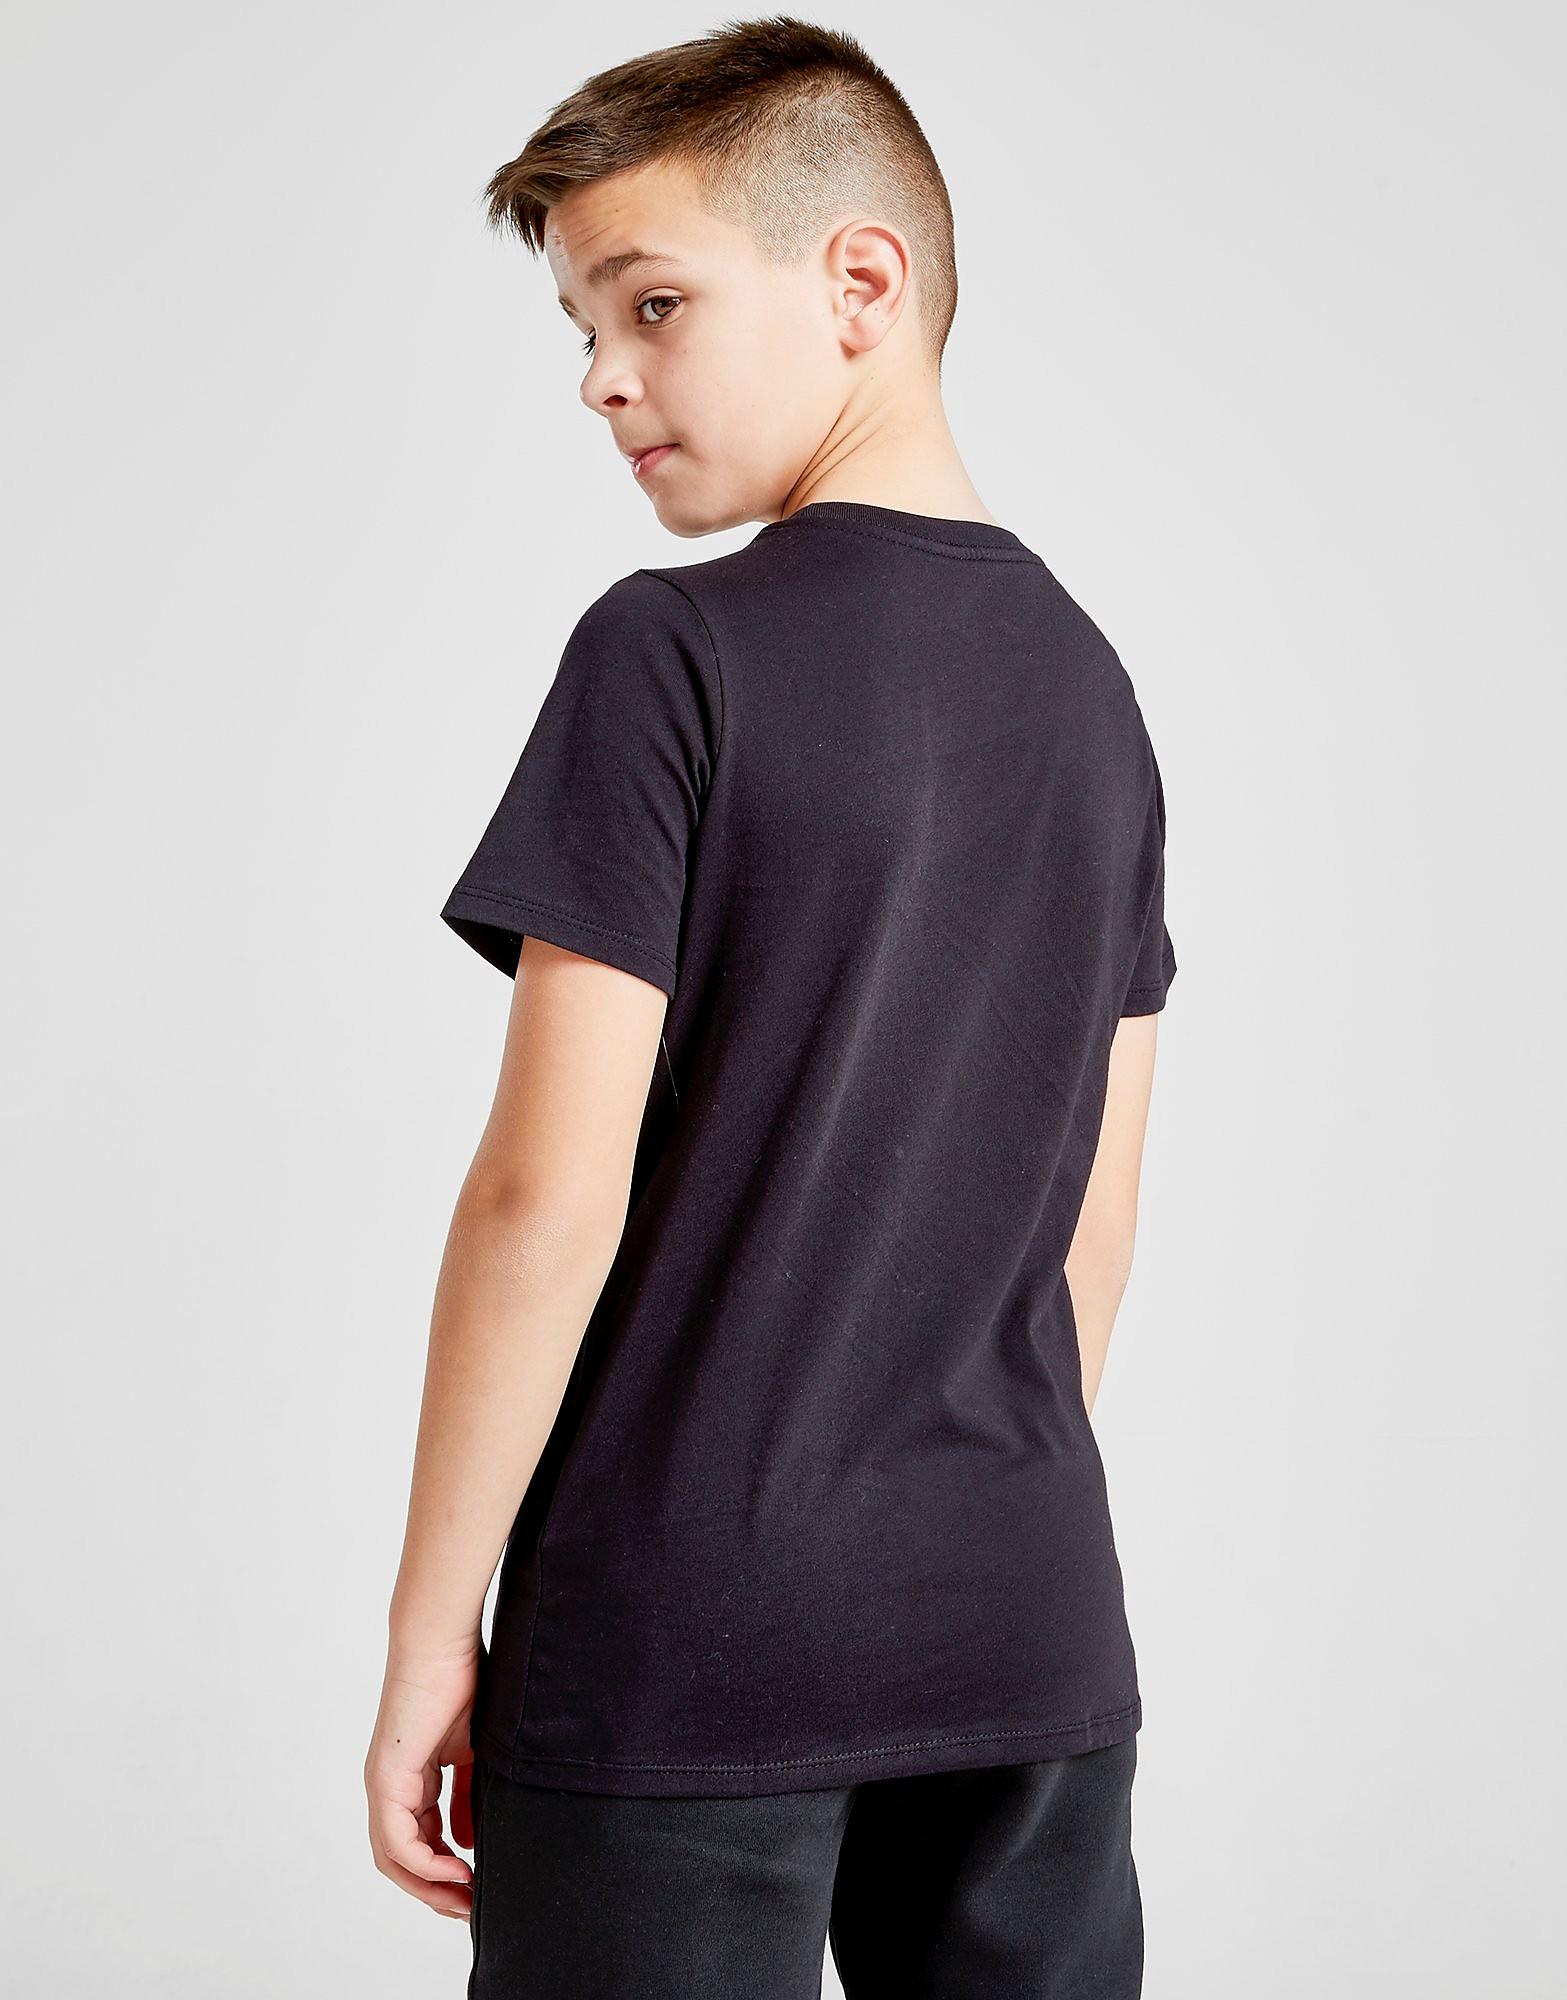 Nike T-shirt Franchise Junior